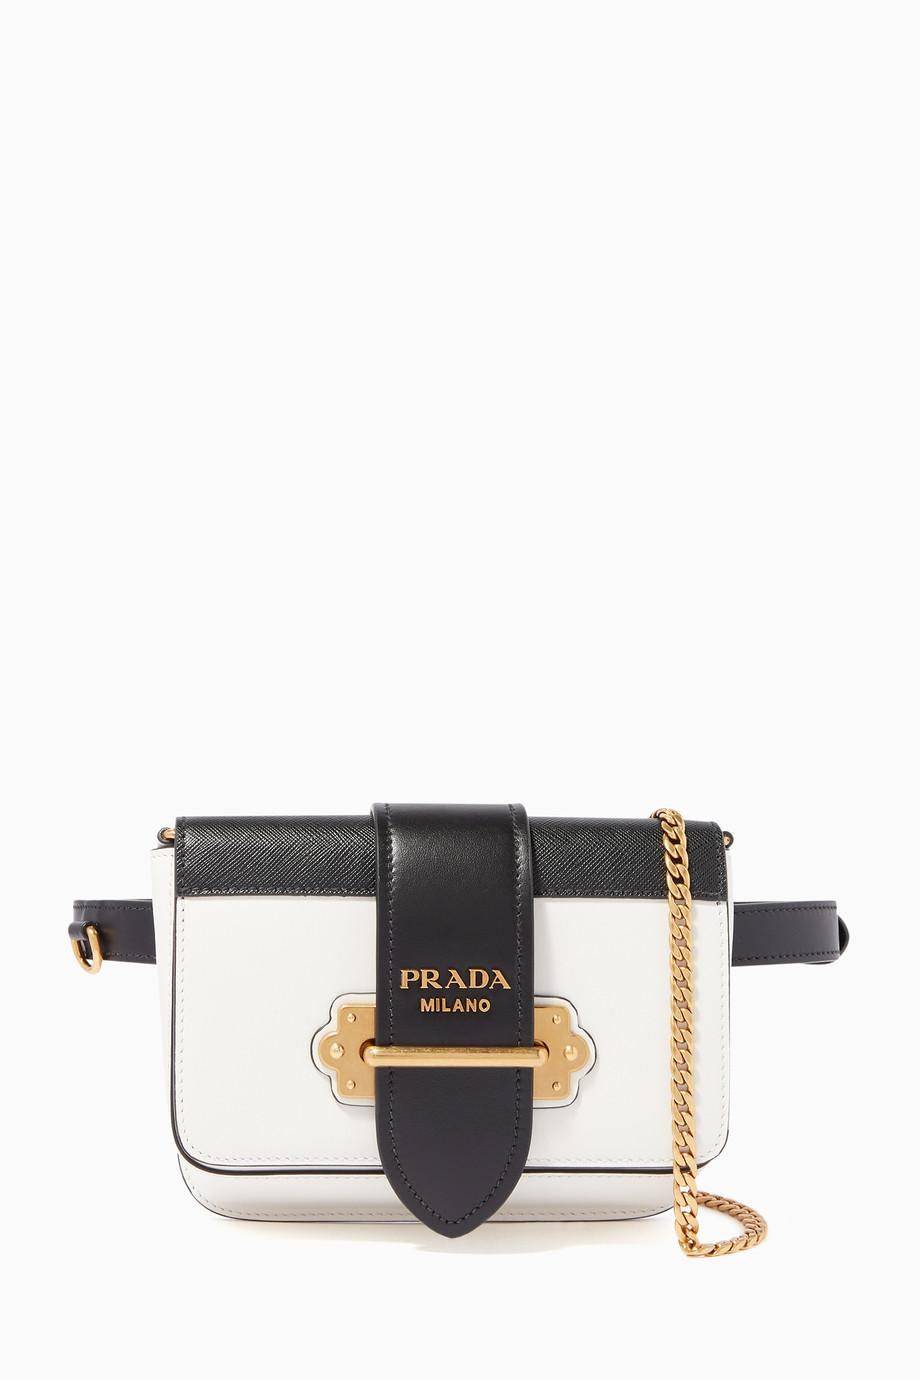 56187371c571a7 Shop Prada White White & Black Cahier Belt Bag for Women | Ounass